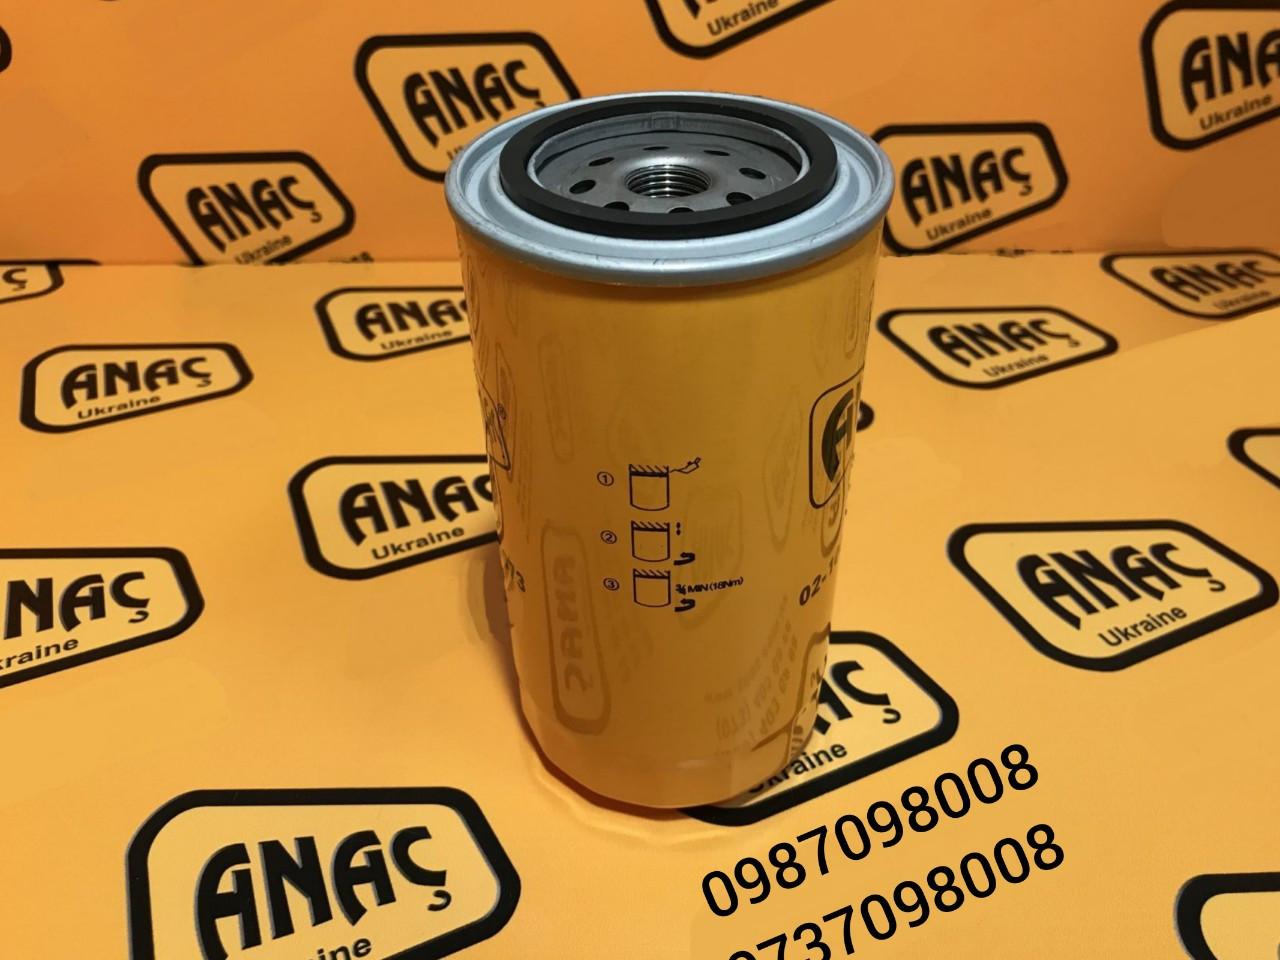 Фильтр масла для двигателя Perkins на JCB 3CX, 4CX номер : 02/100073, 2654407